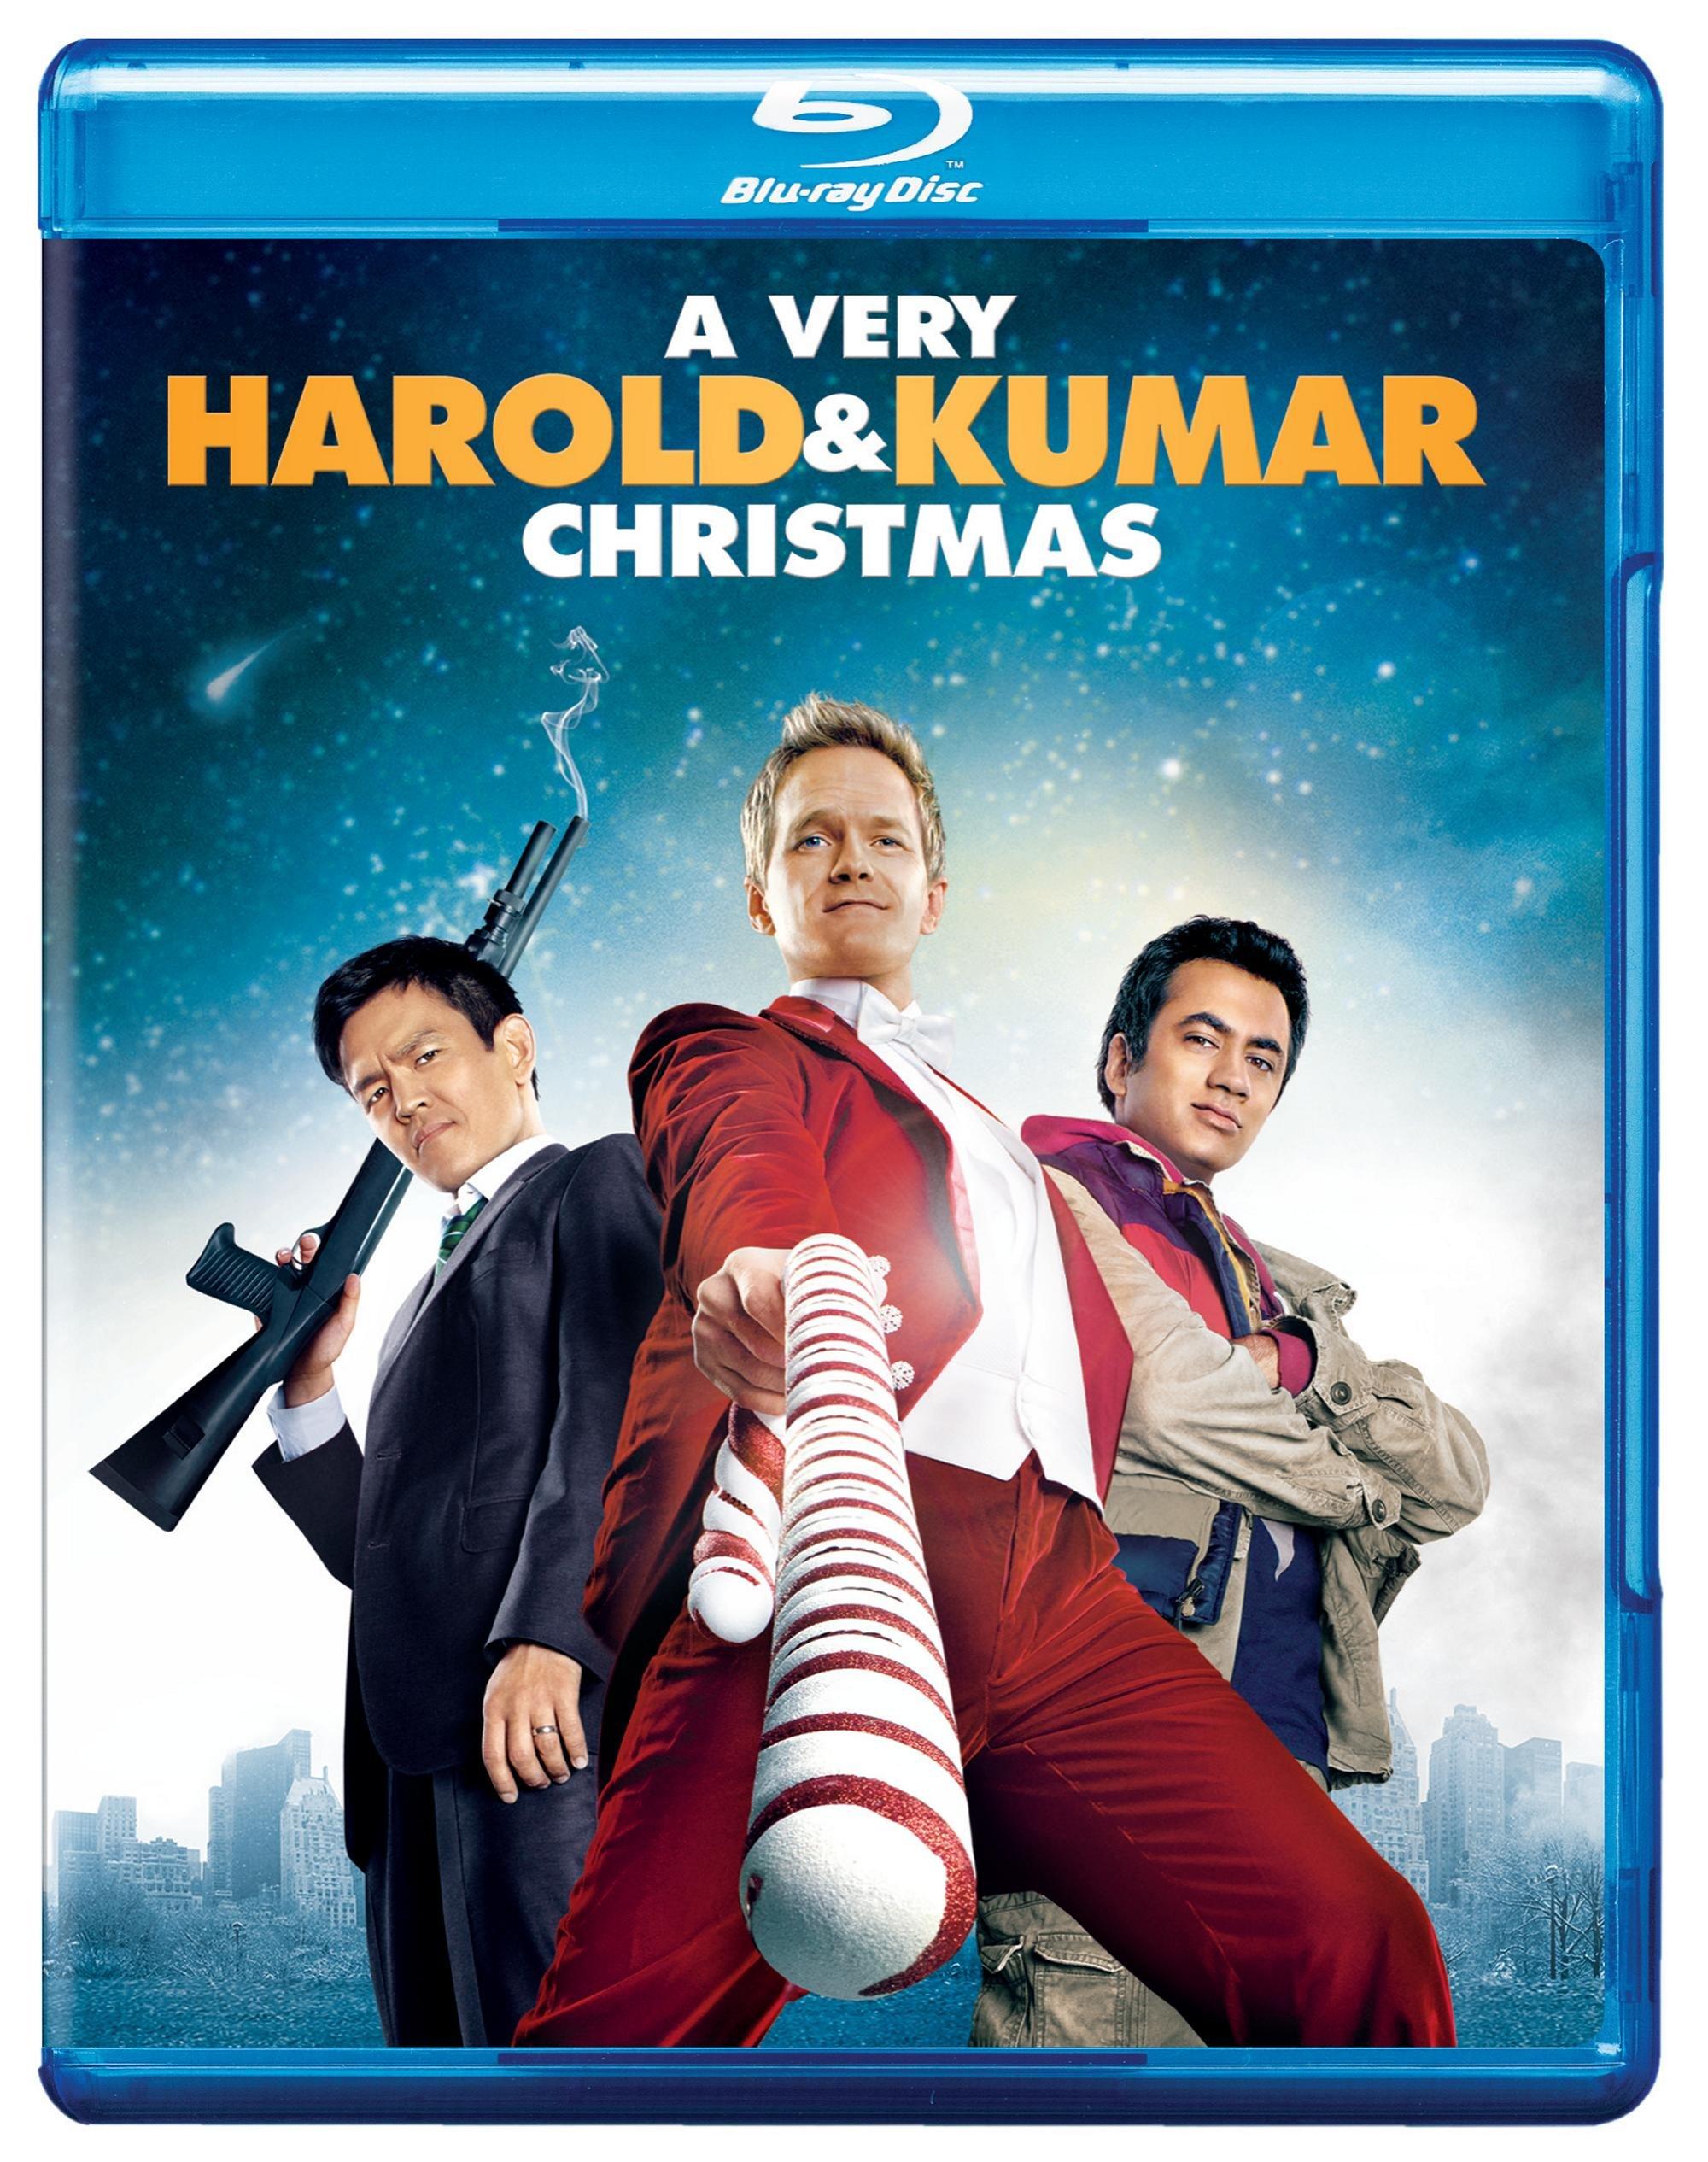 Blu-ray : A Very Harold & Kumar 3D Christmas (Ultraviolet Digital Copy)